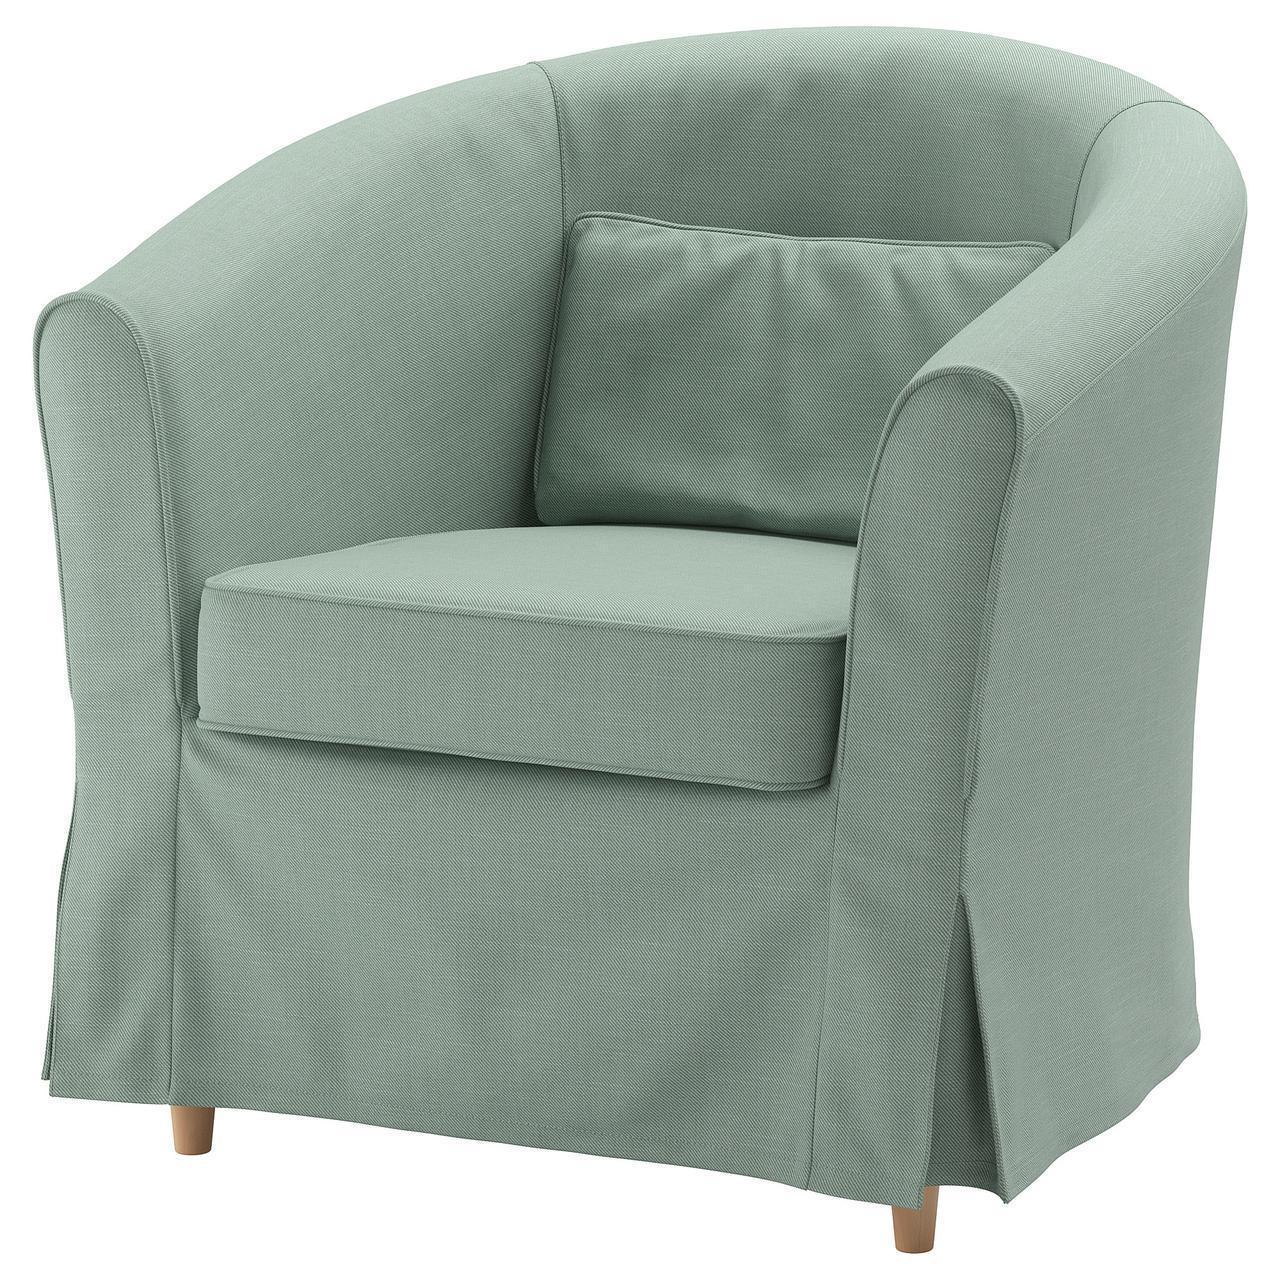 Крісло IKEA TULLSTA Nordvalla світло-зелене 392.727.16